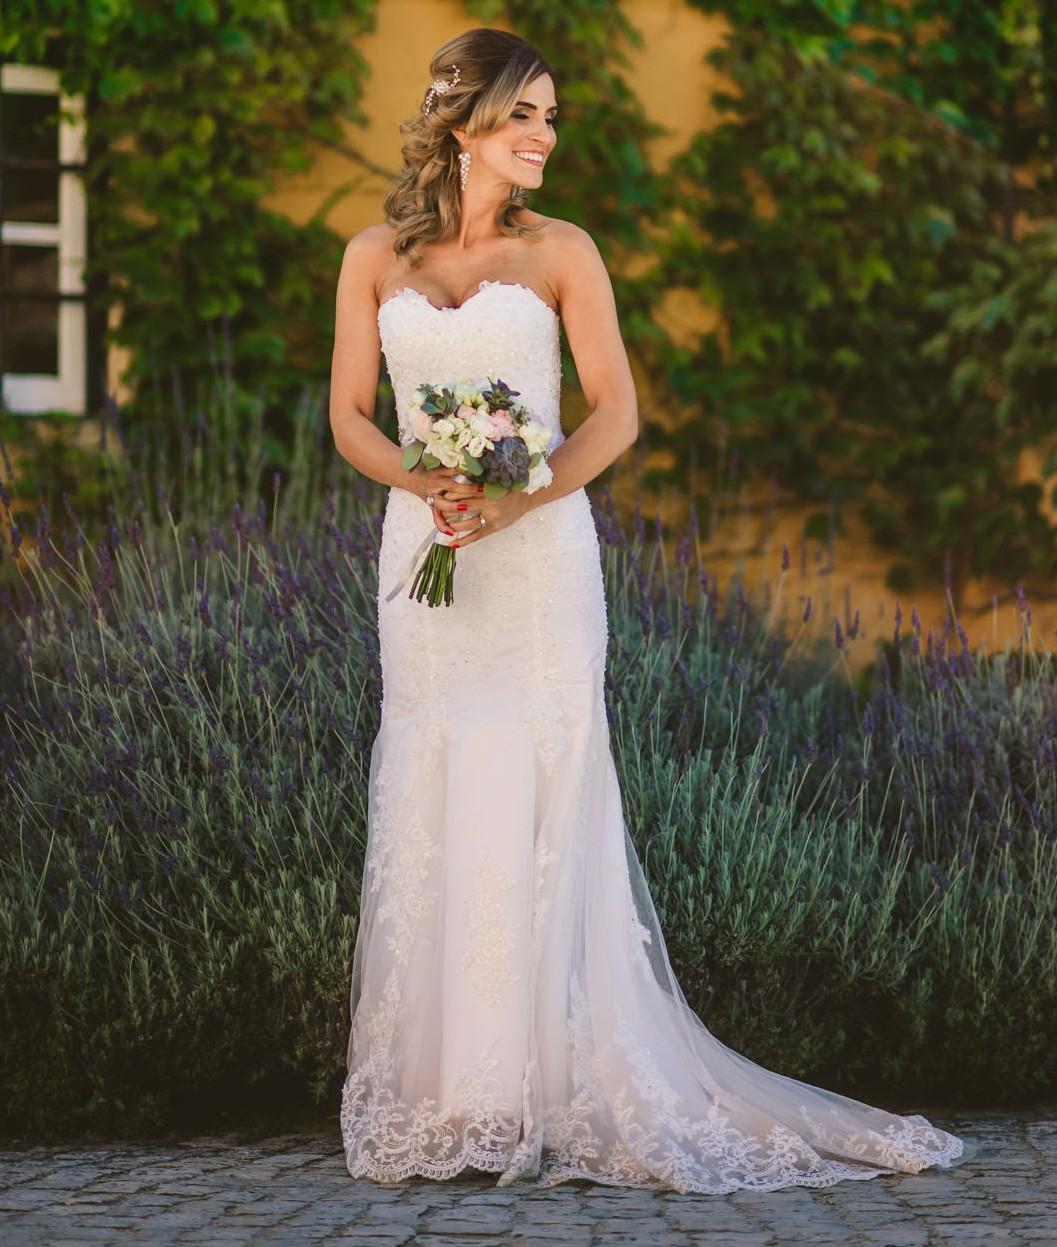 Maggie Sottero Custom Made Second Hand Wedding Dress On